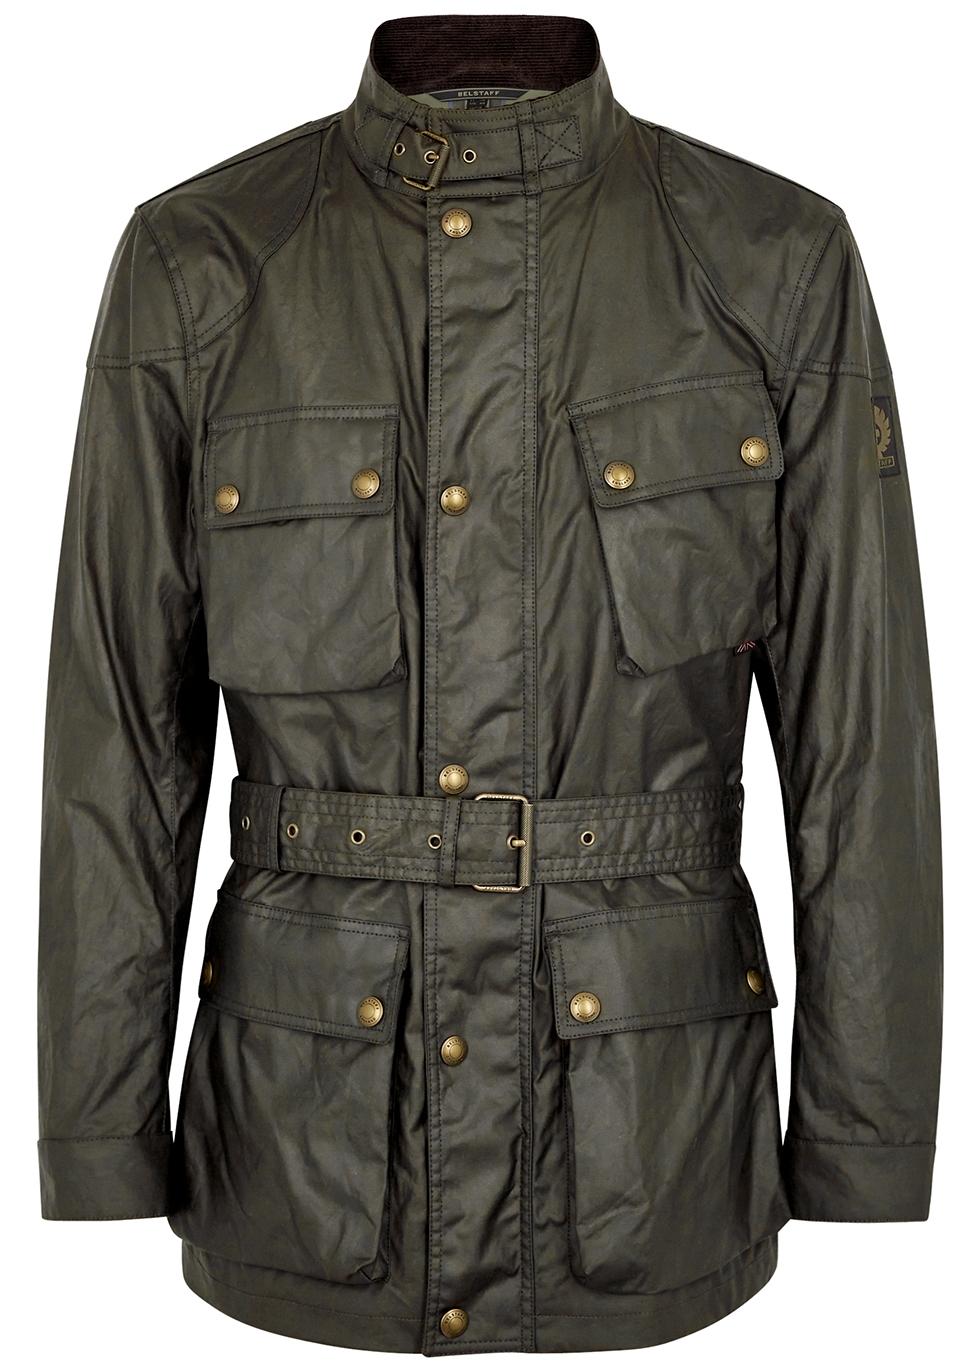 Trialmaster dark olive waxed cotton jacket